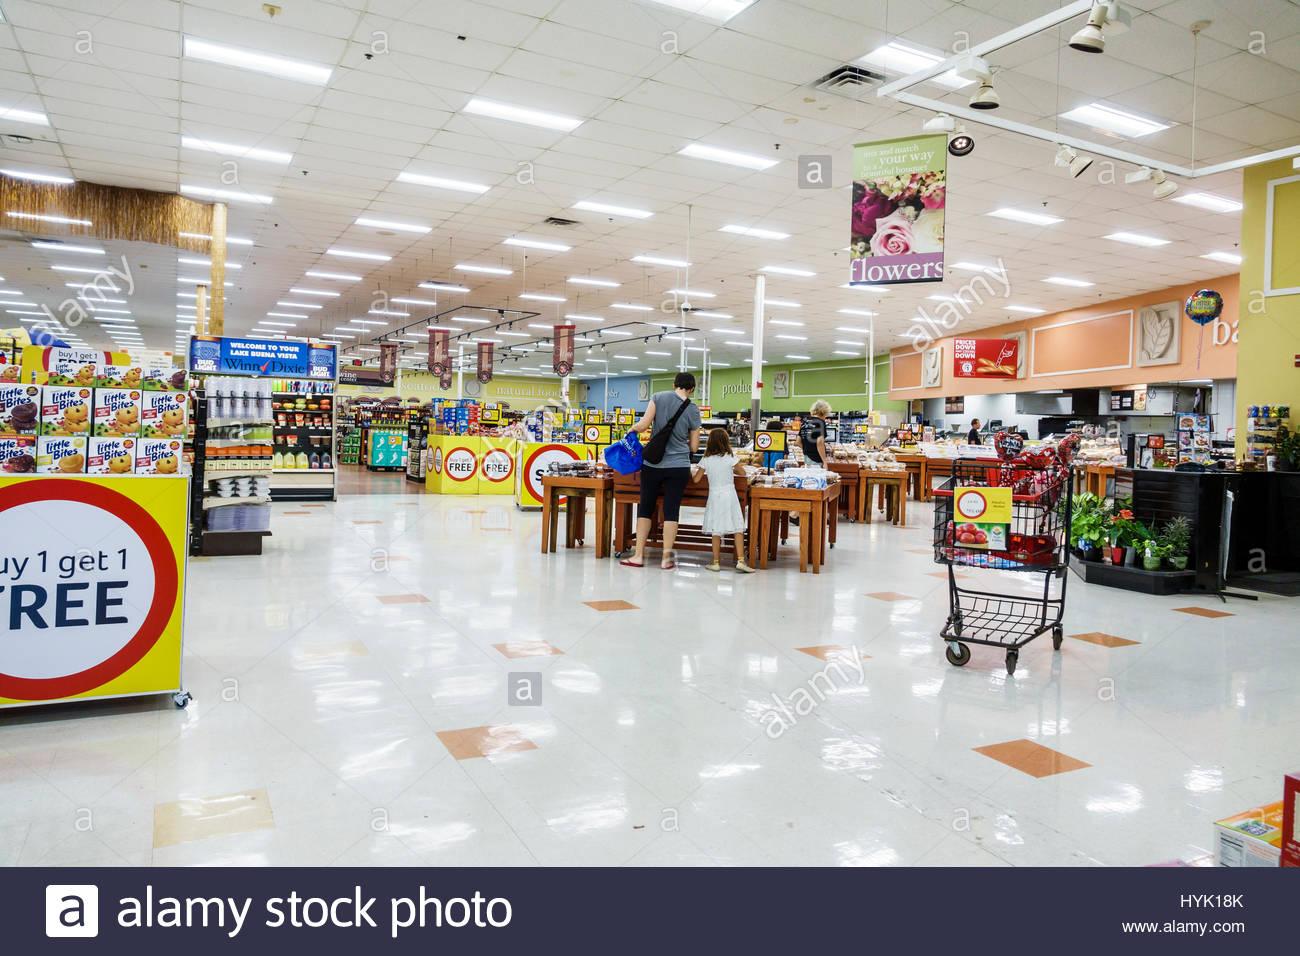 orlando-florida-lake-buena-vista-winn-dixie-supermarket-grocery-store-HYK18K.jpg